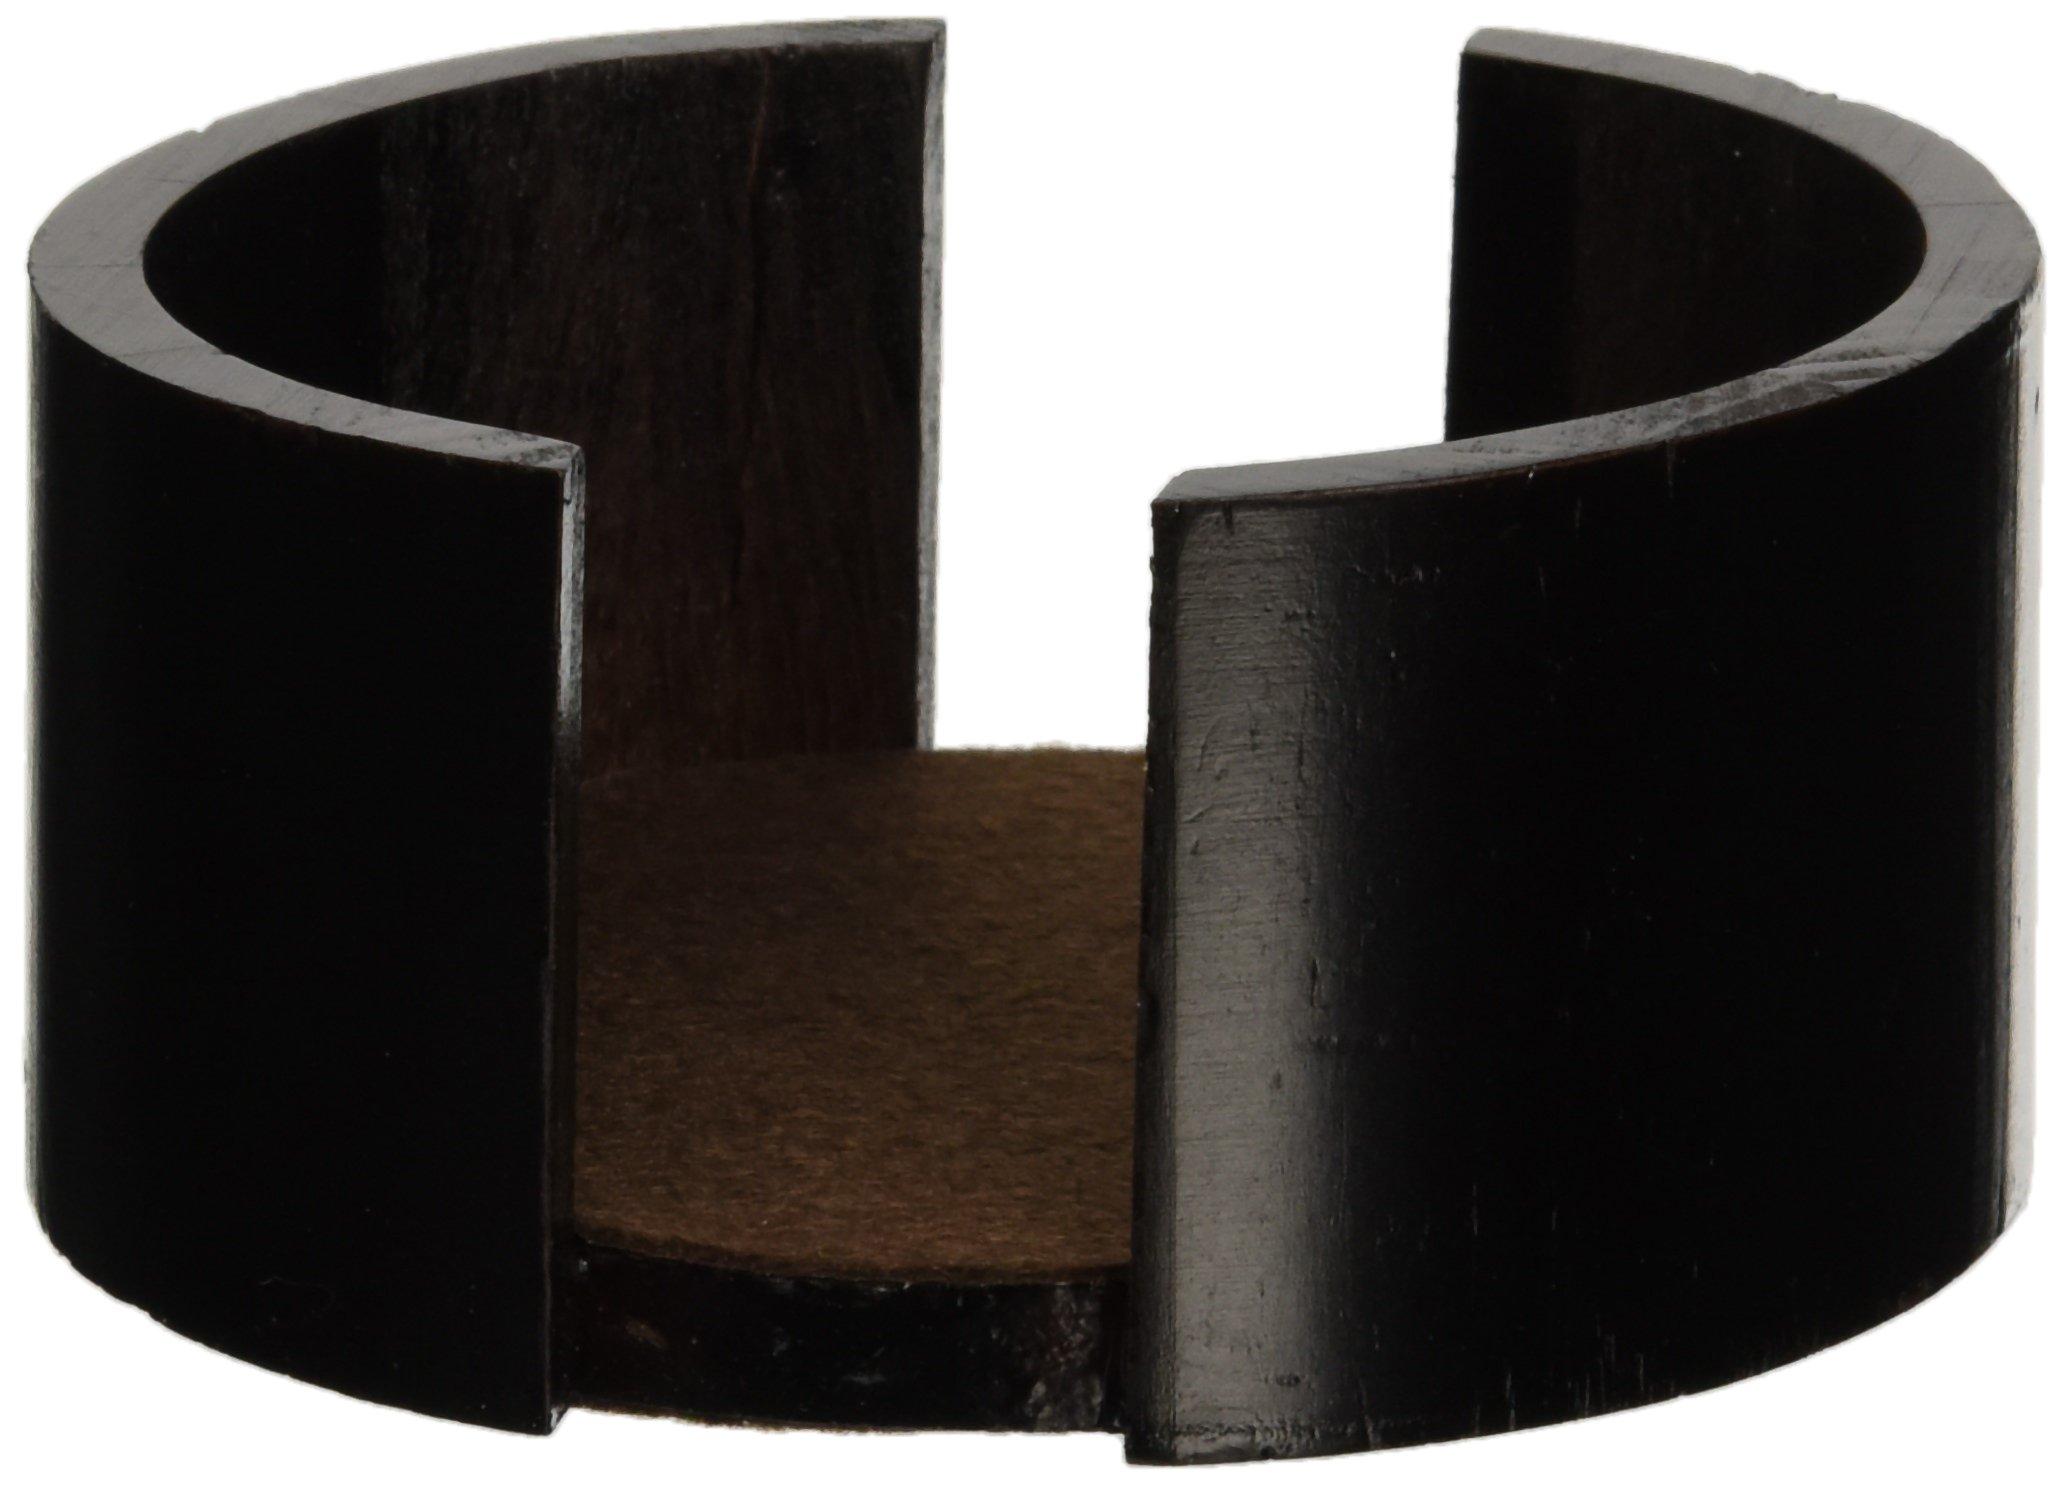 Thirstystone Circular Coaster Holder, Walnut